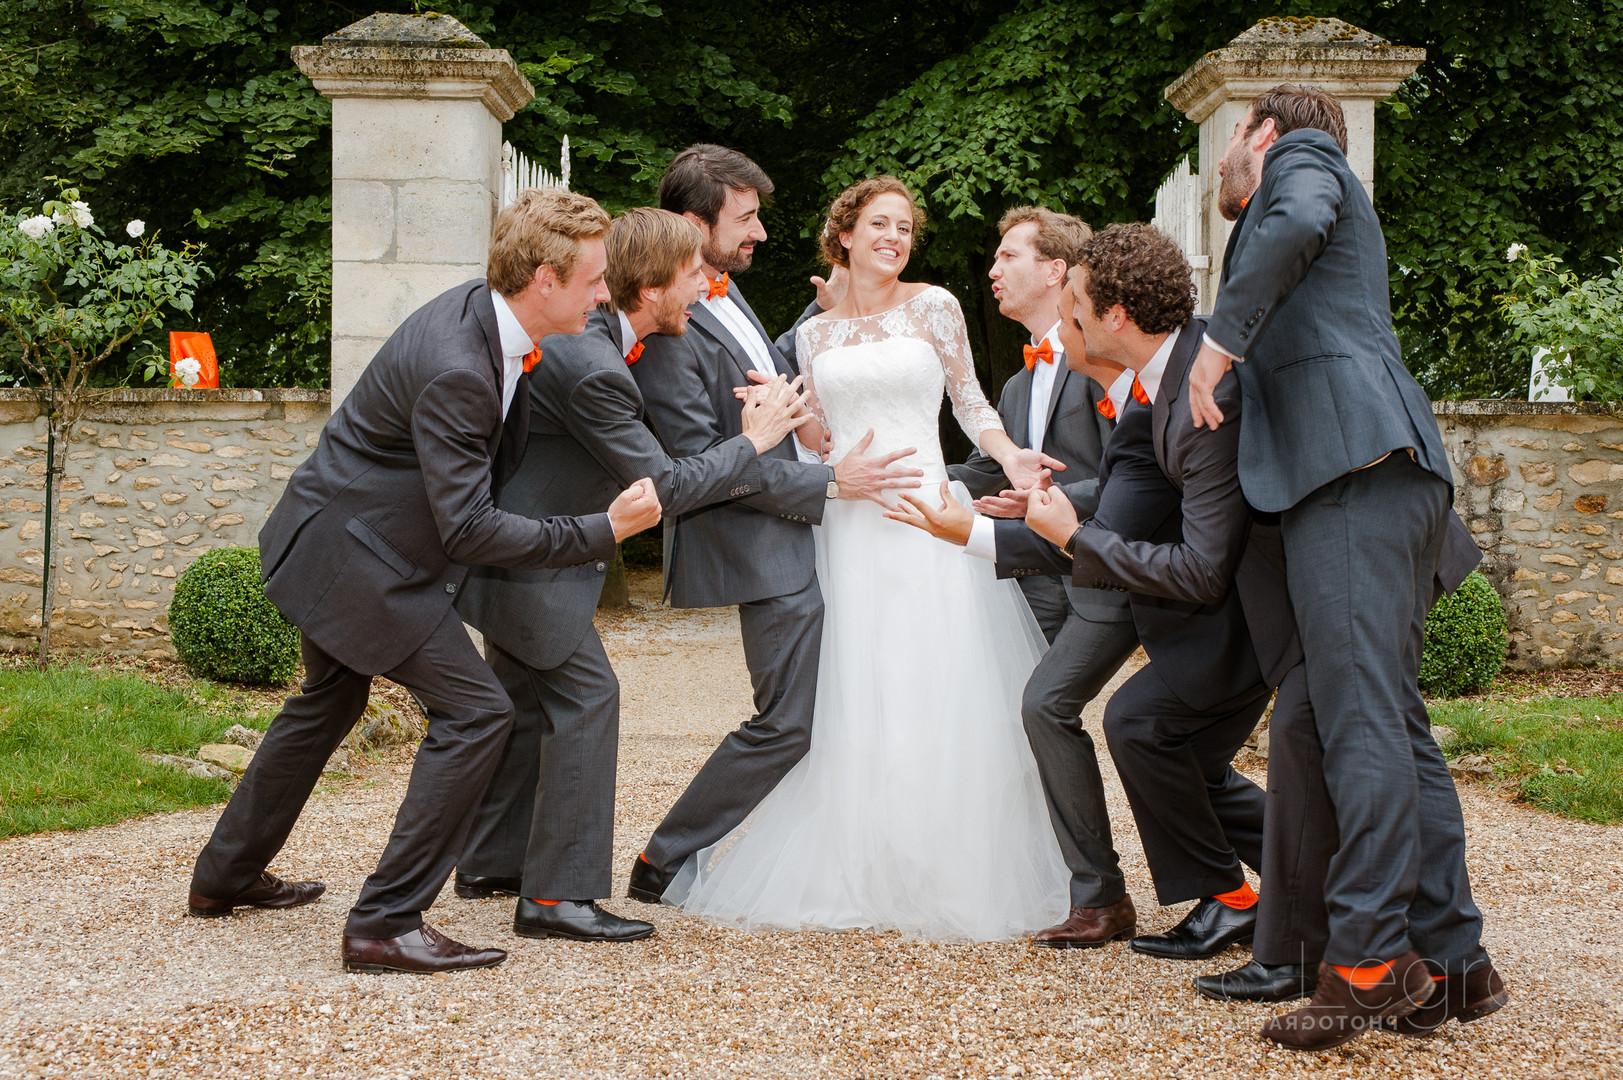 photographe Angers mariage amis